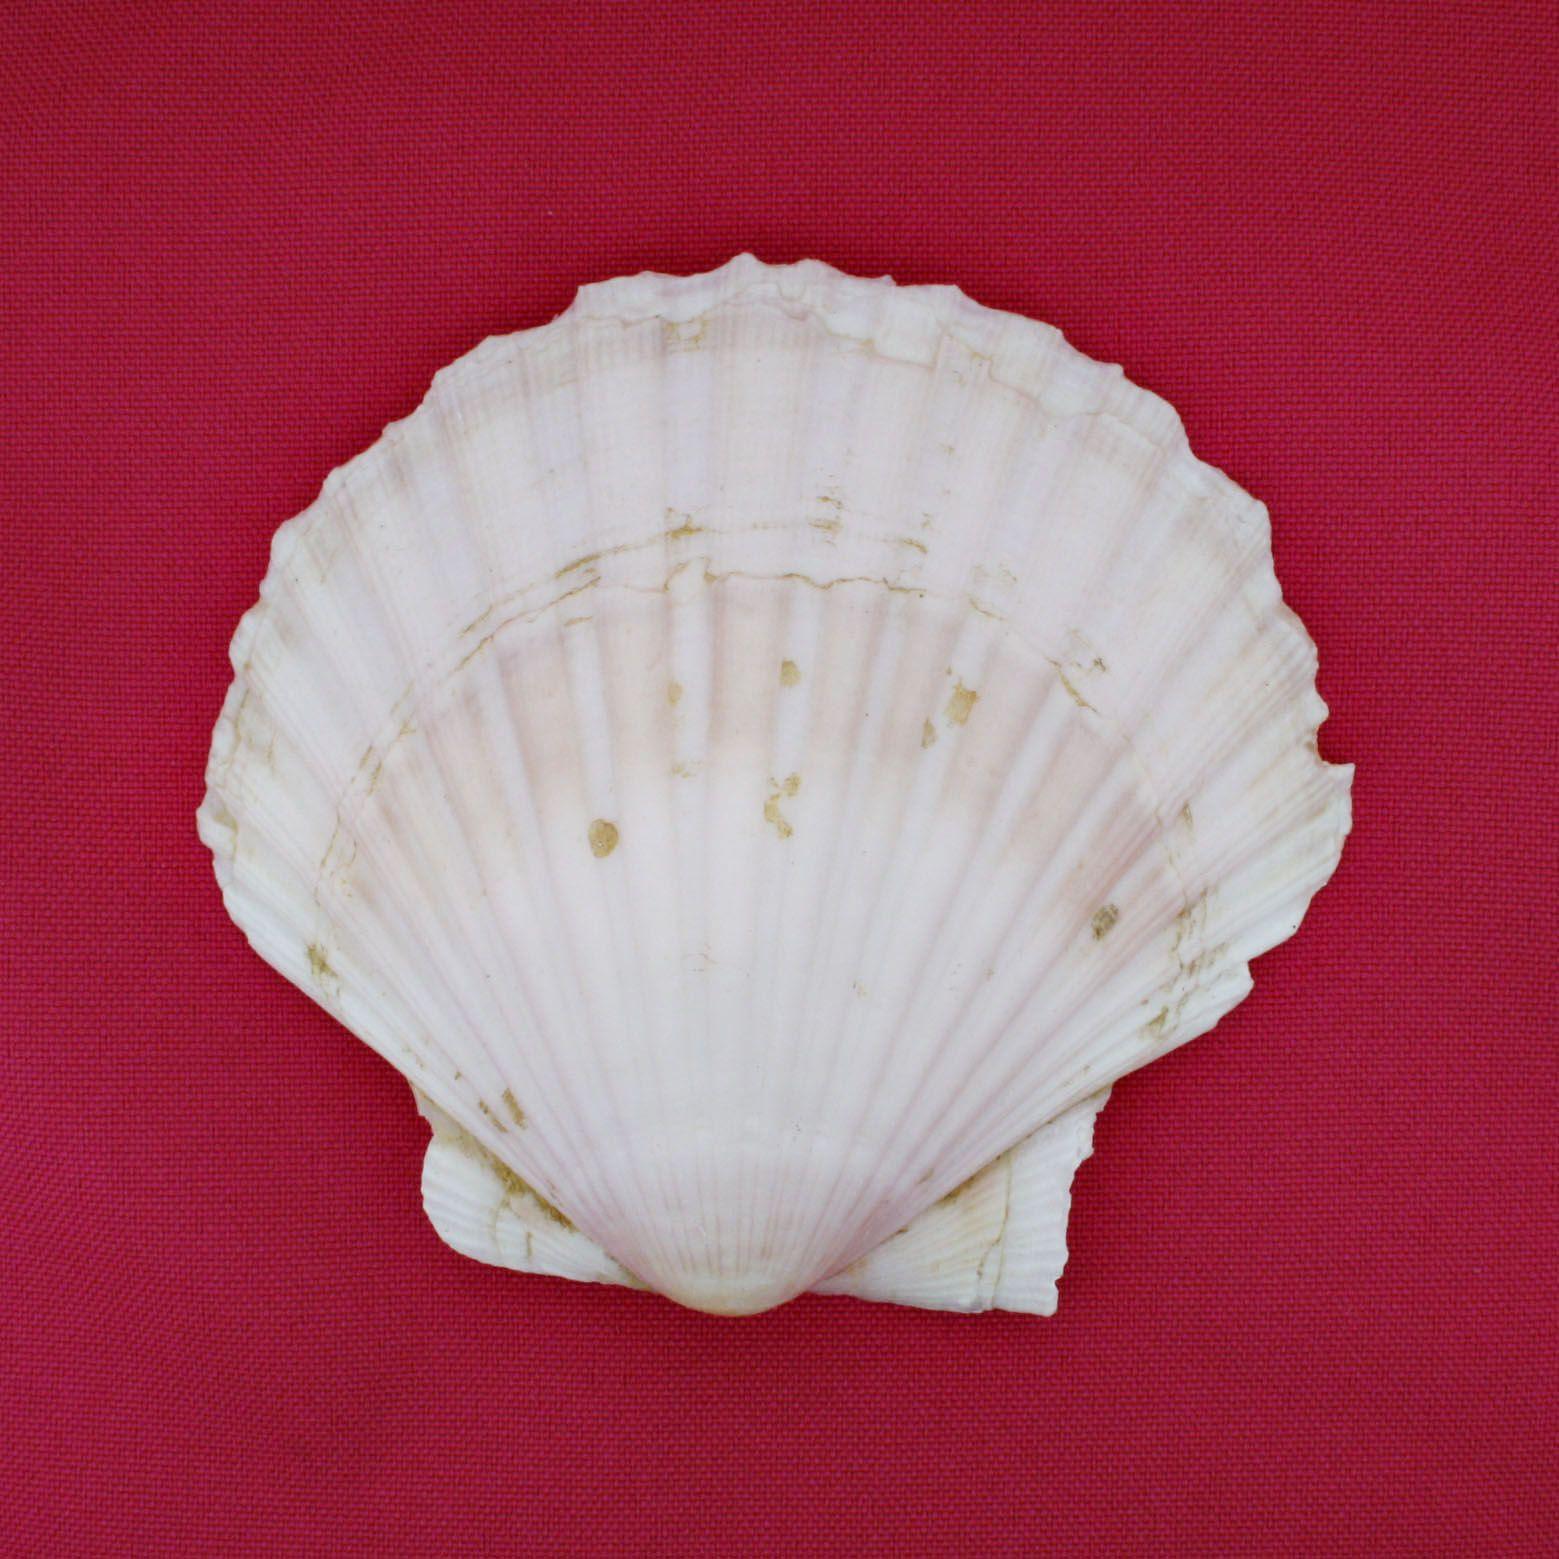 Concha - Pecten White Scallop (Trachycardium)  - Stéphanie Bijoux® - Peças para Bijuterias e Artesanato